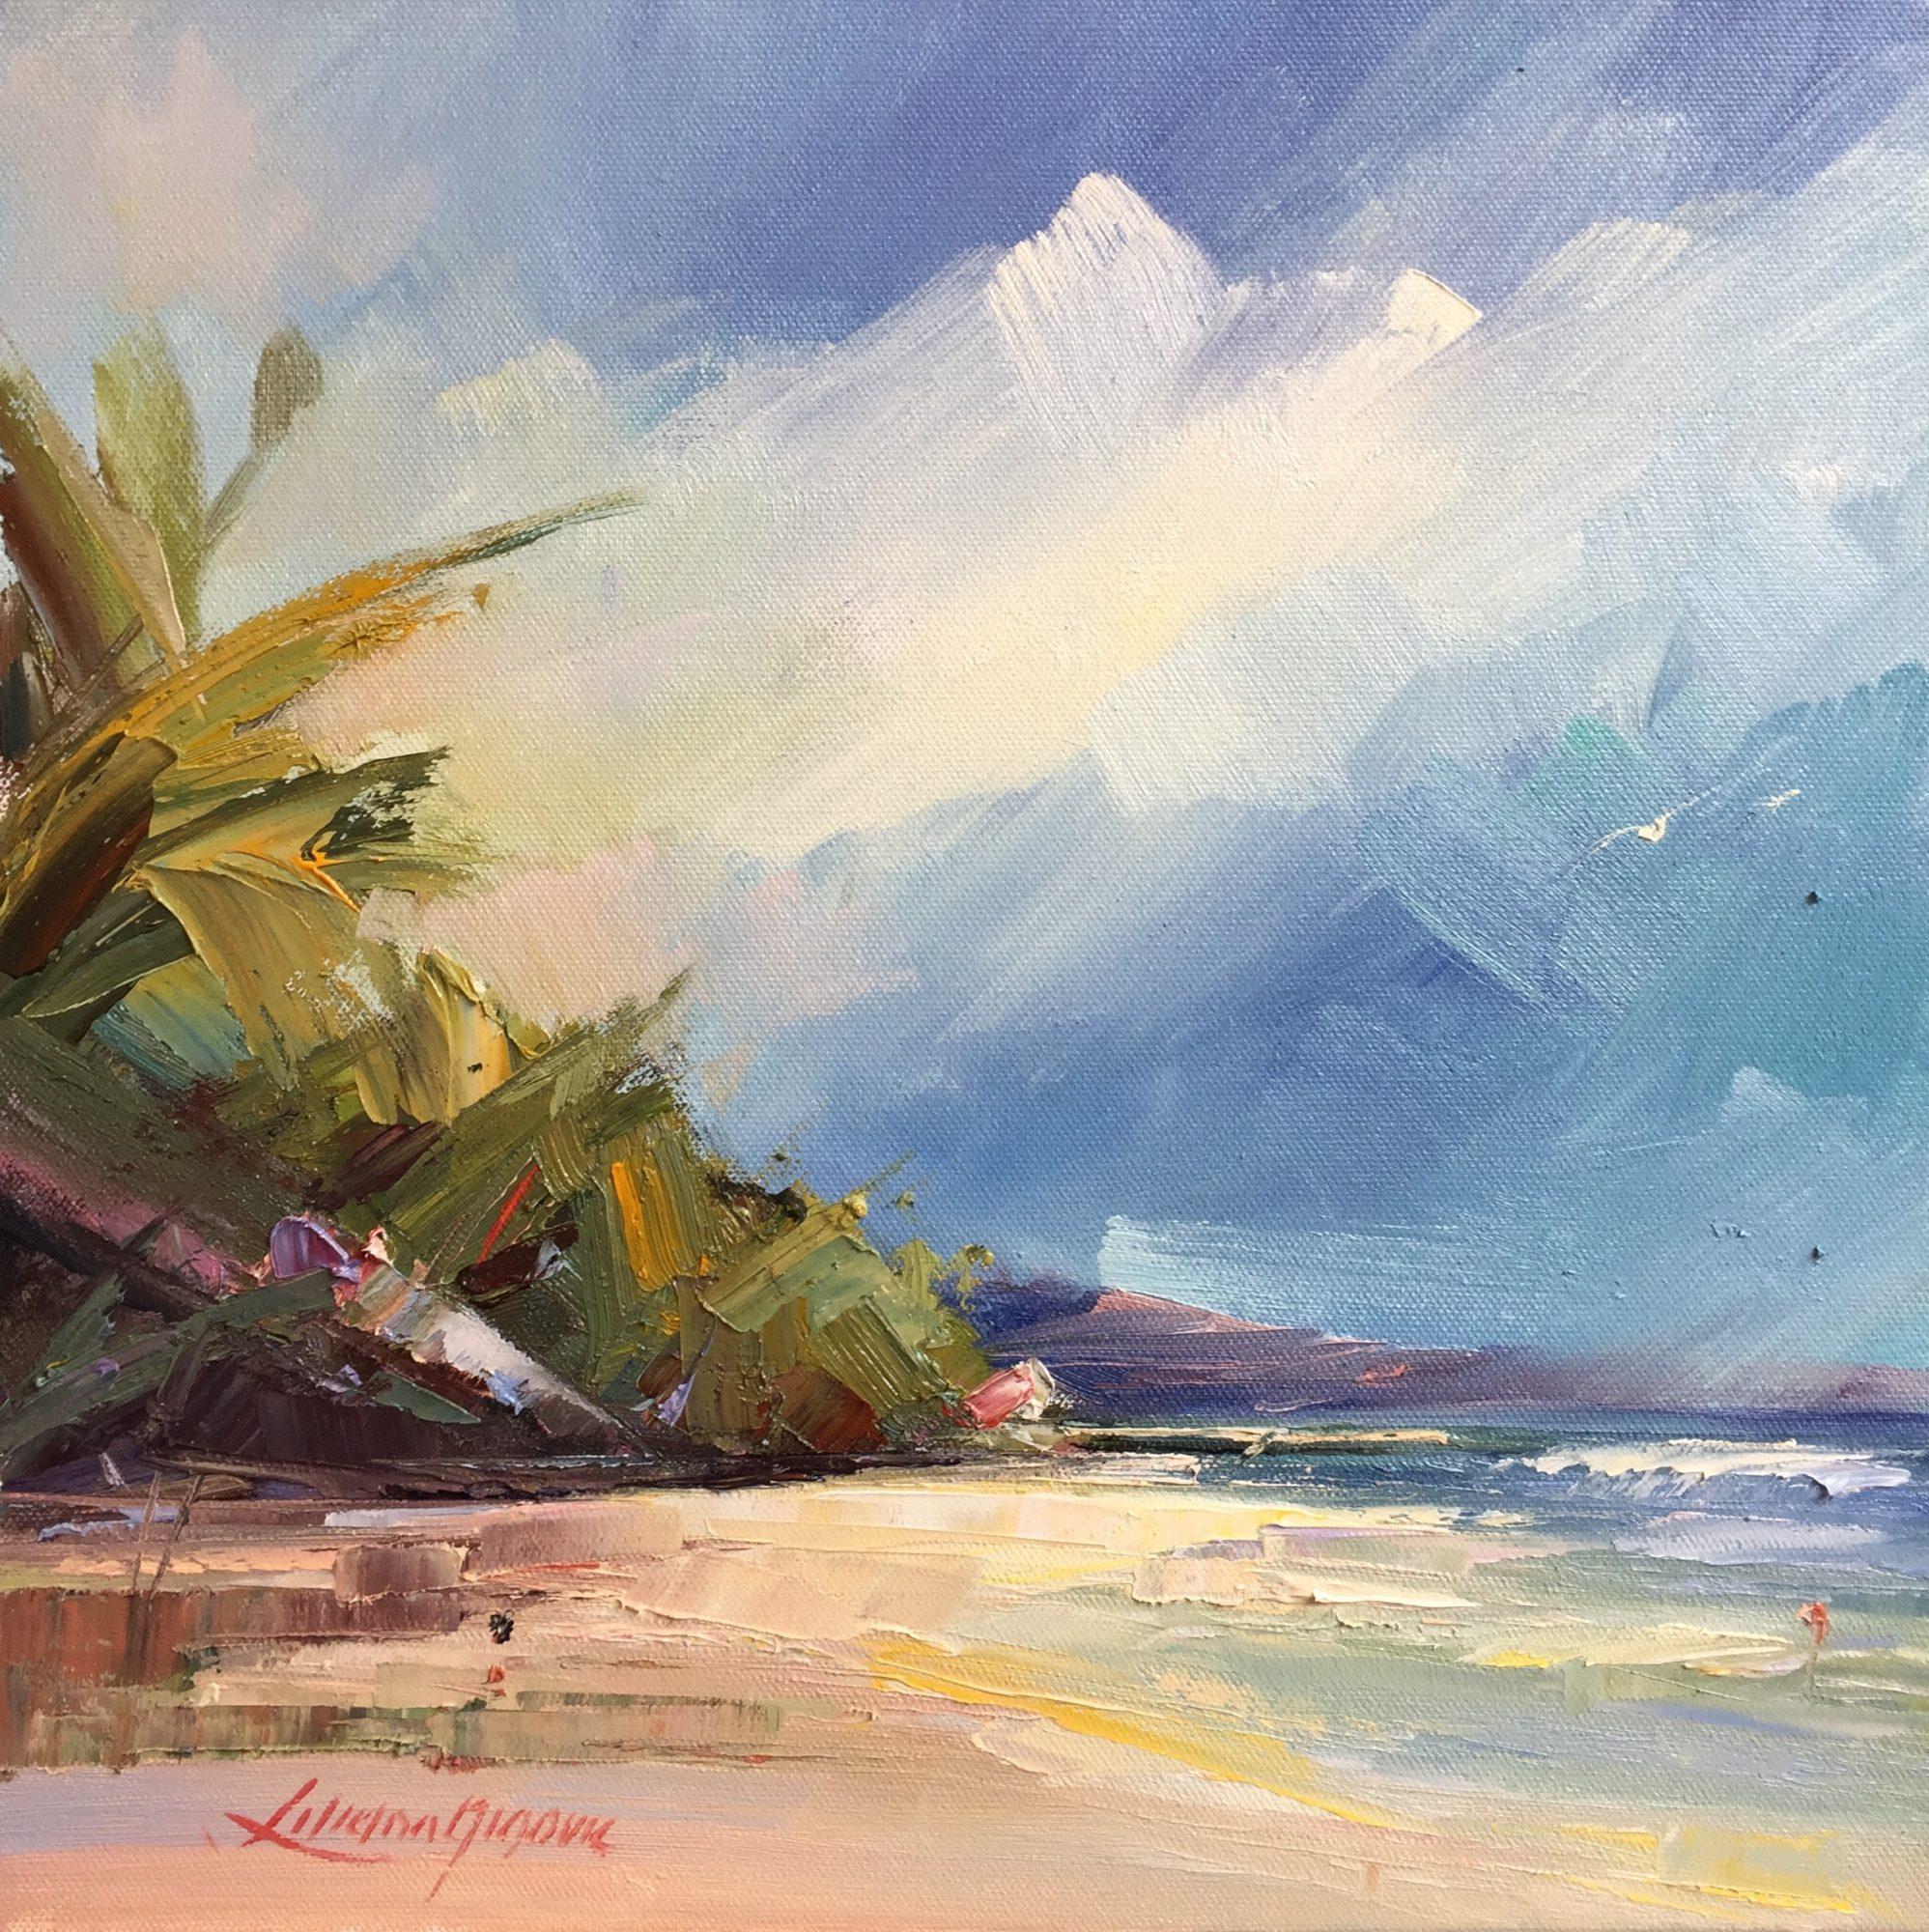 181-Noosa's Main beach #3,size,35.5×35.5×3.5cm